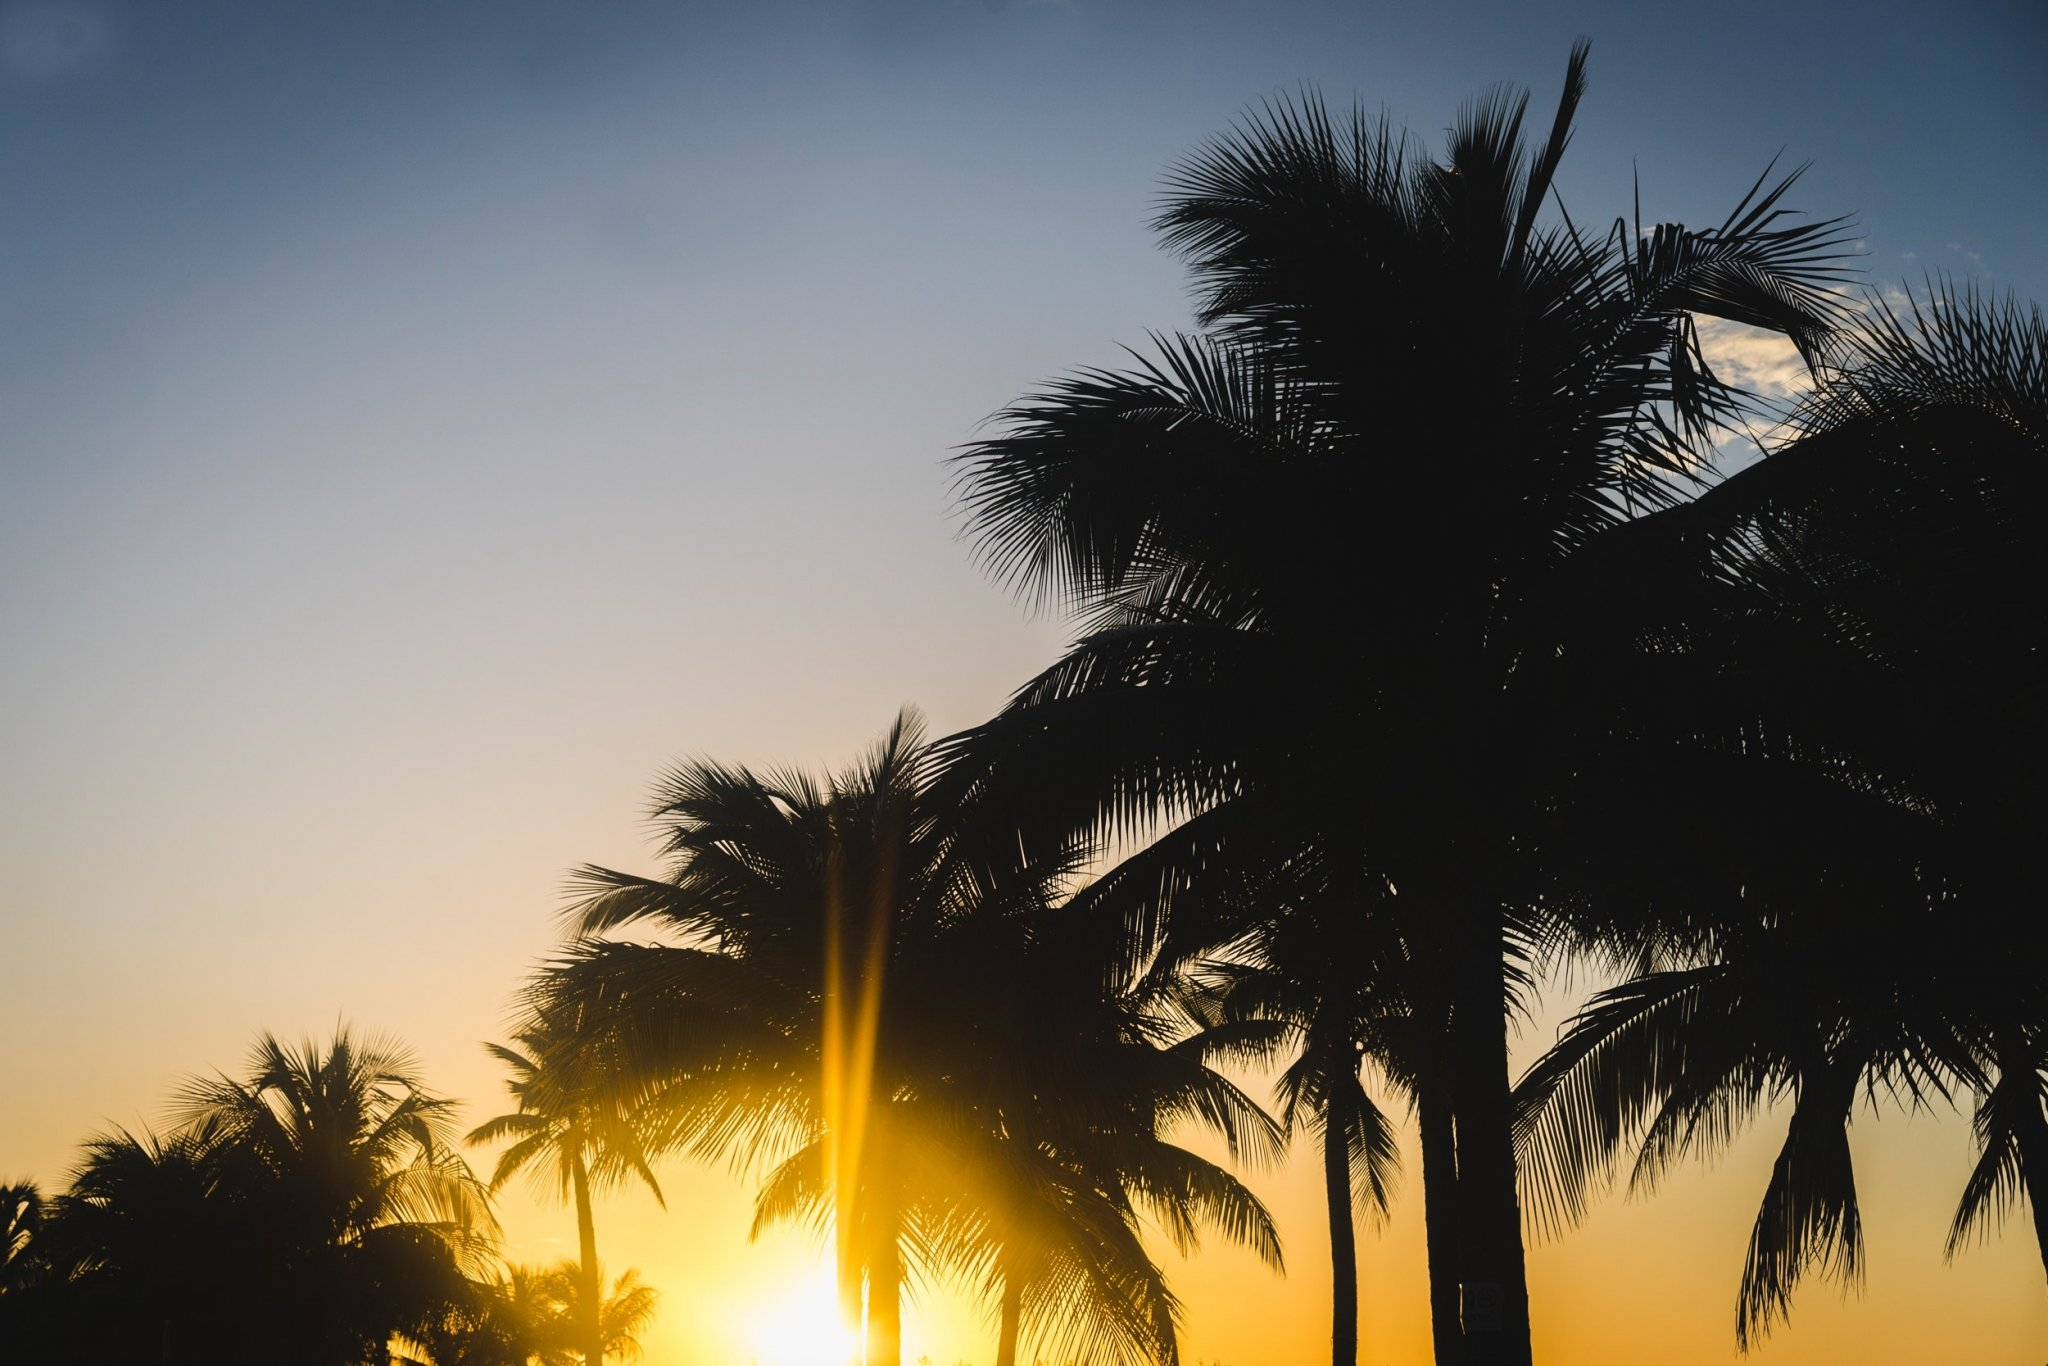 jamaica reis tips